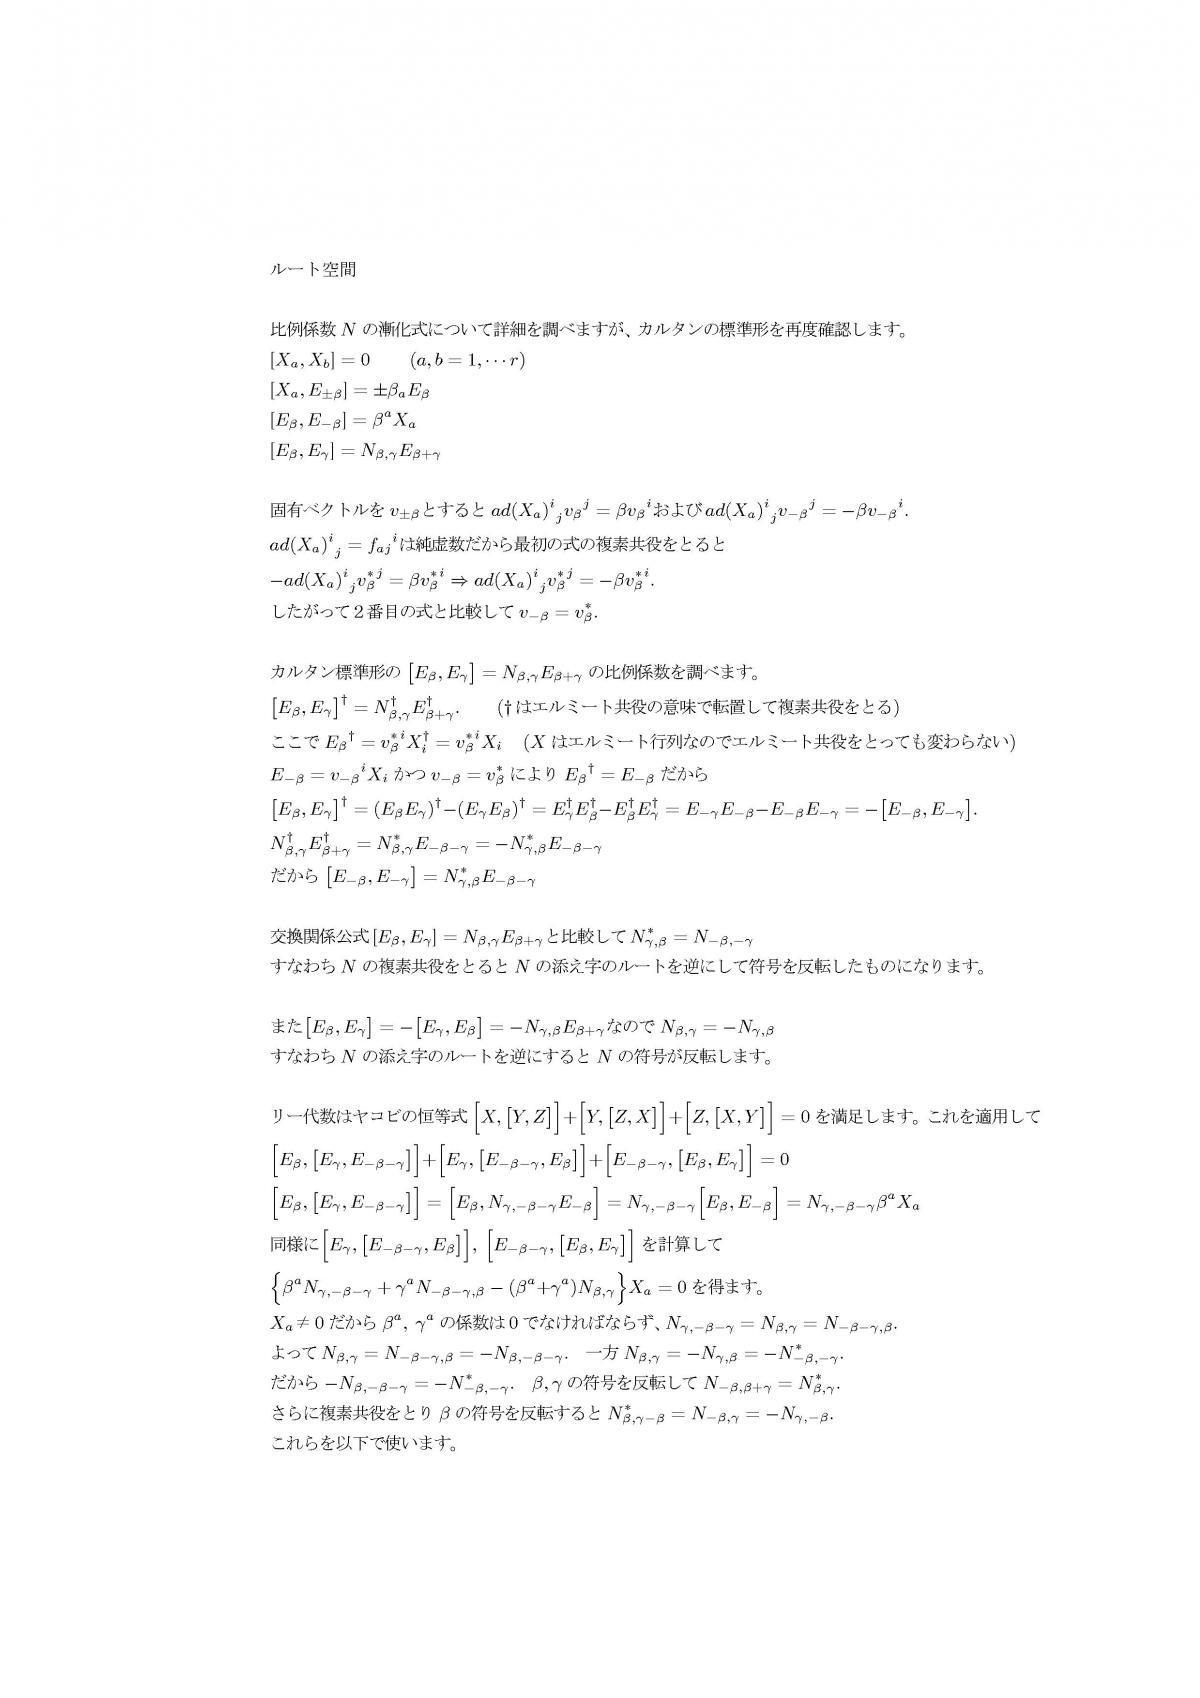 grp130813a.jpg